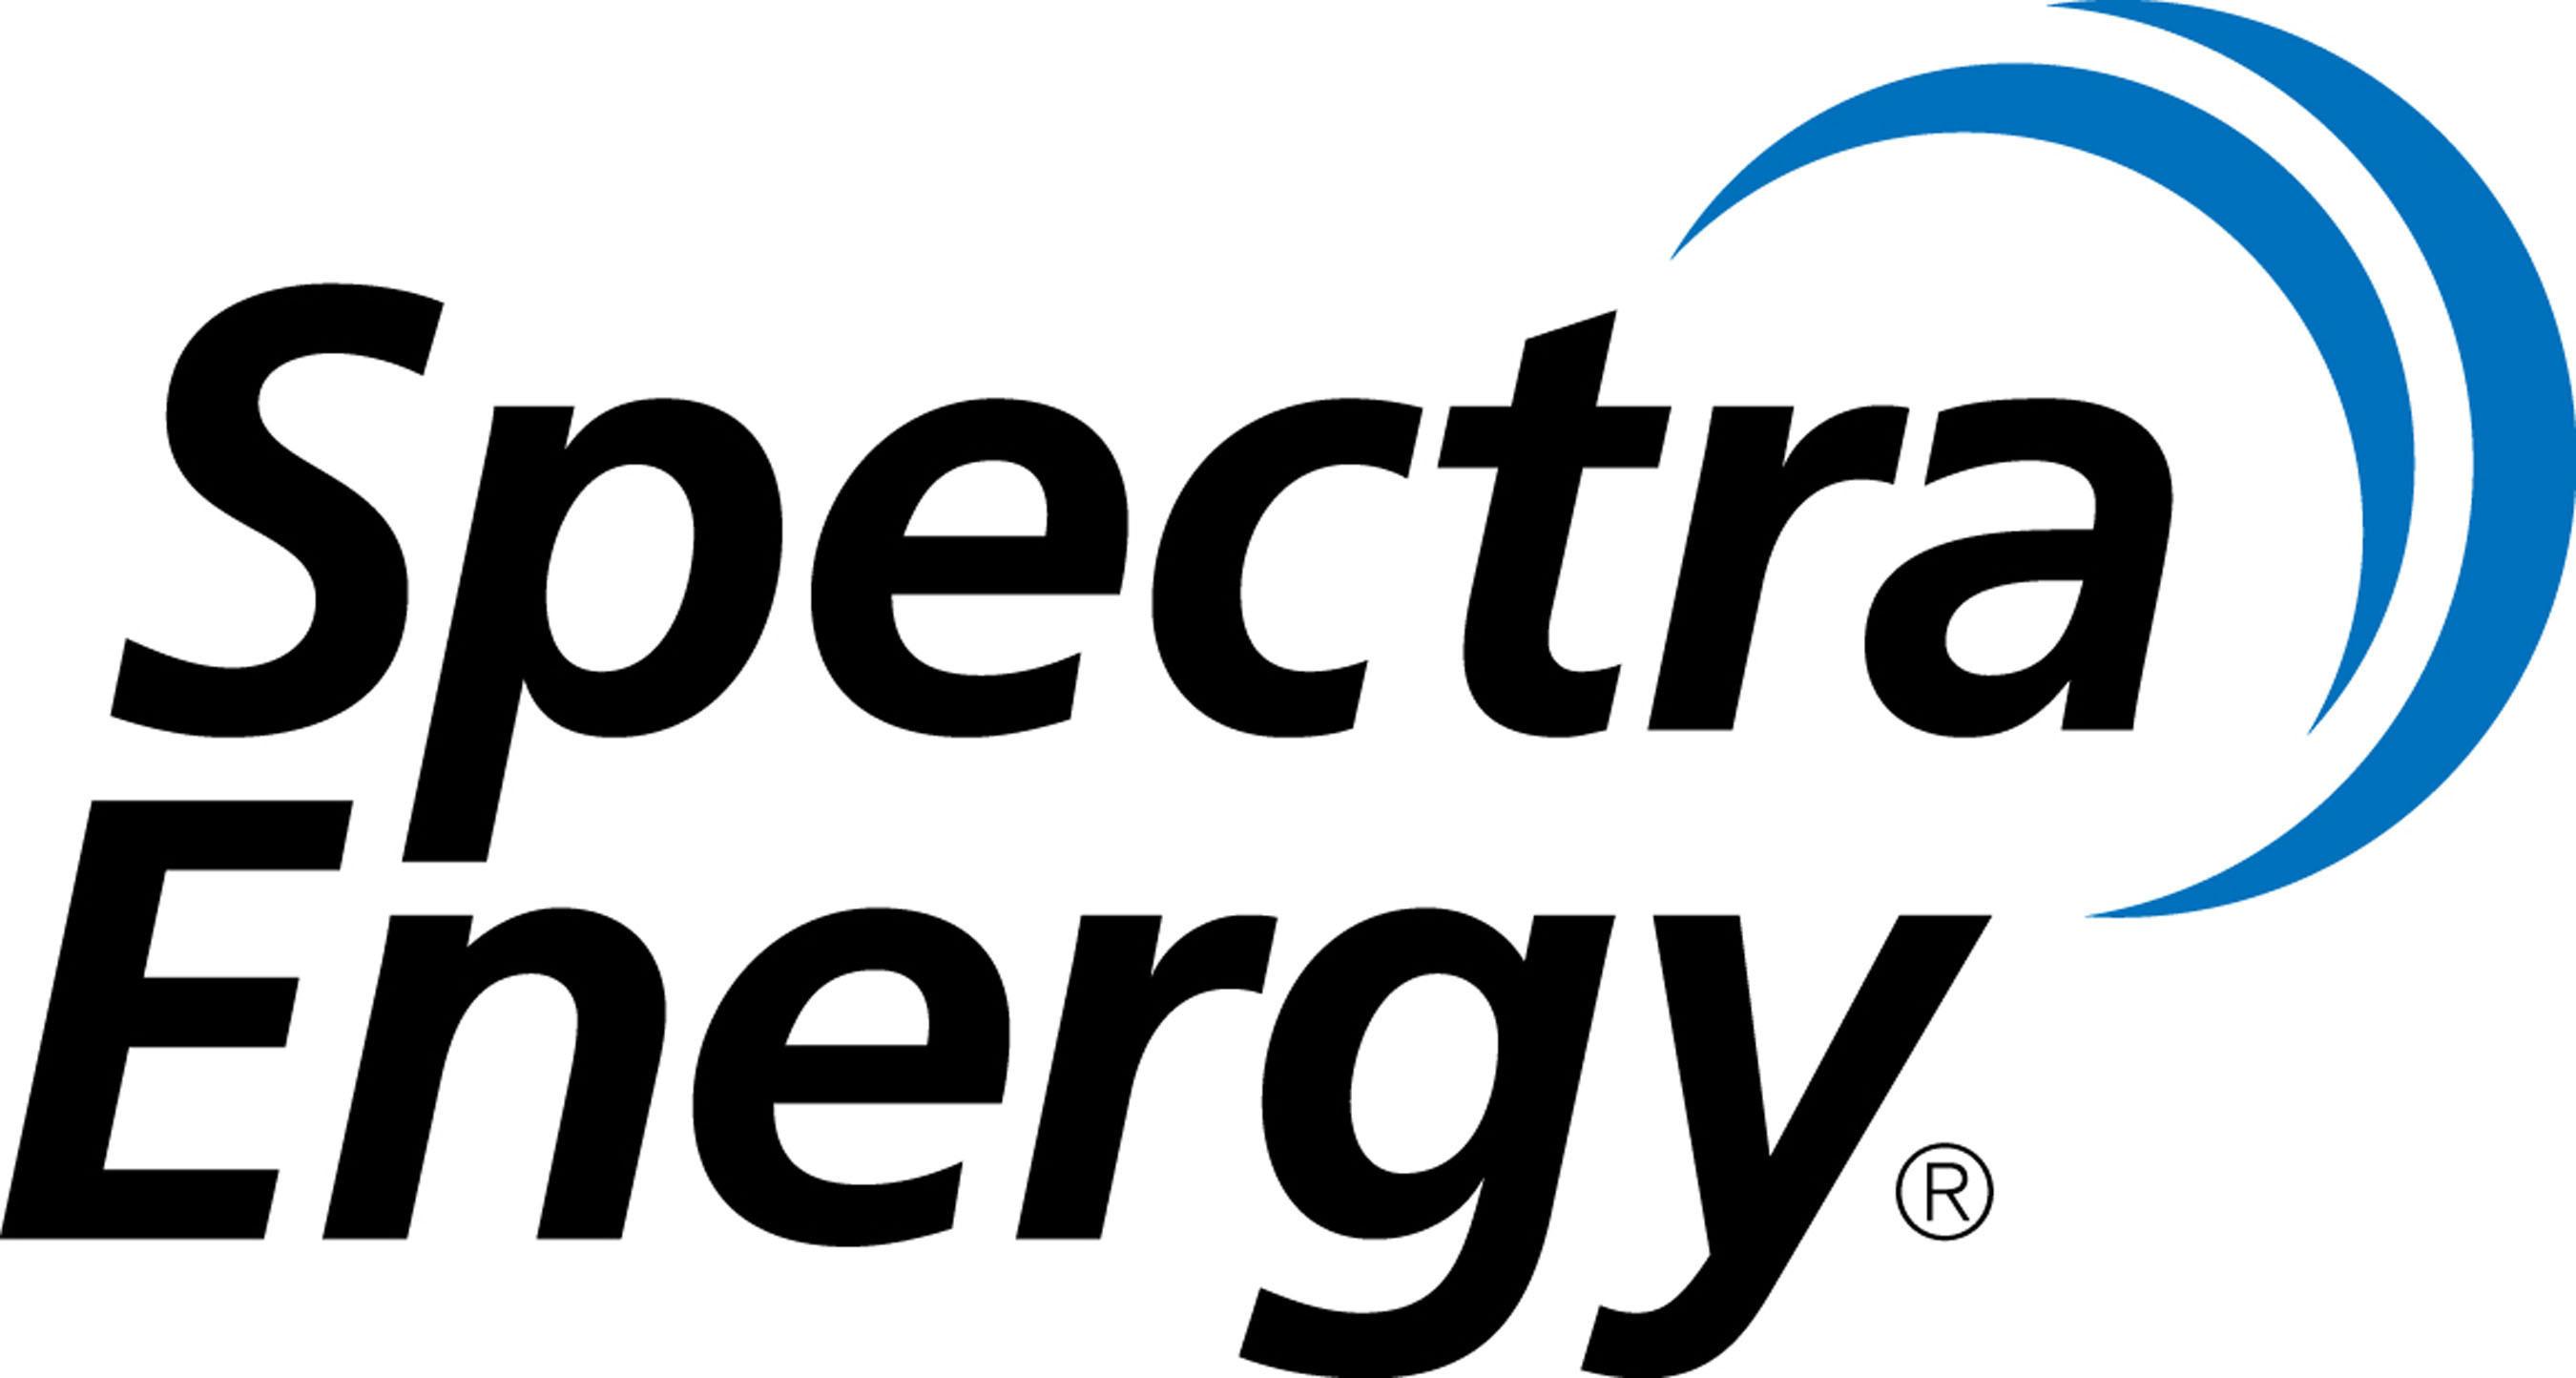 Spectra Energy Corp logo. (PRNewsFoto/Spectra Energy)